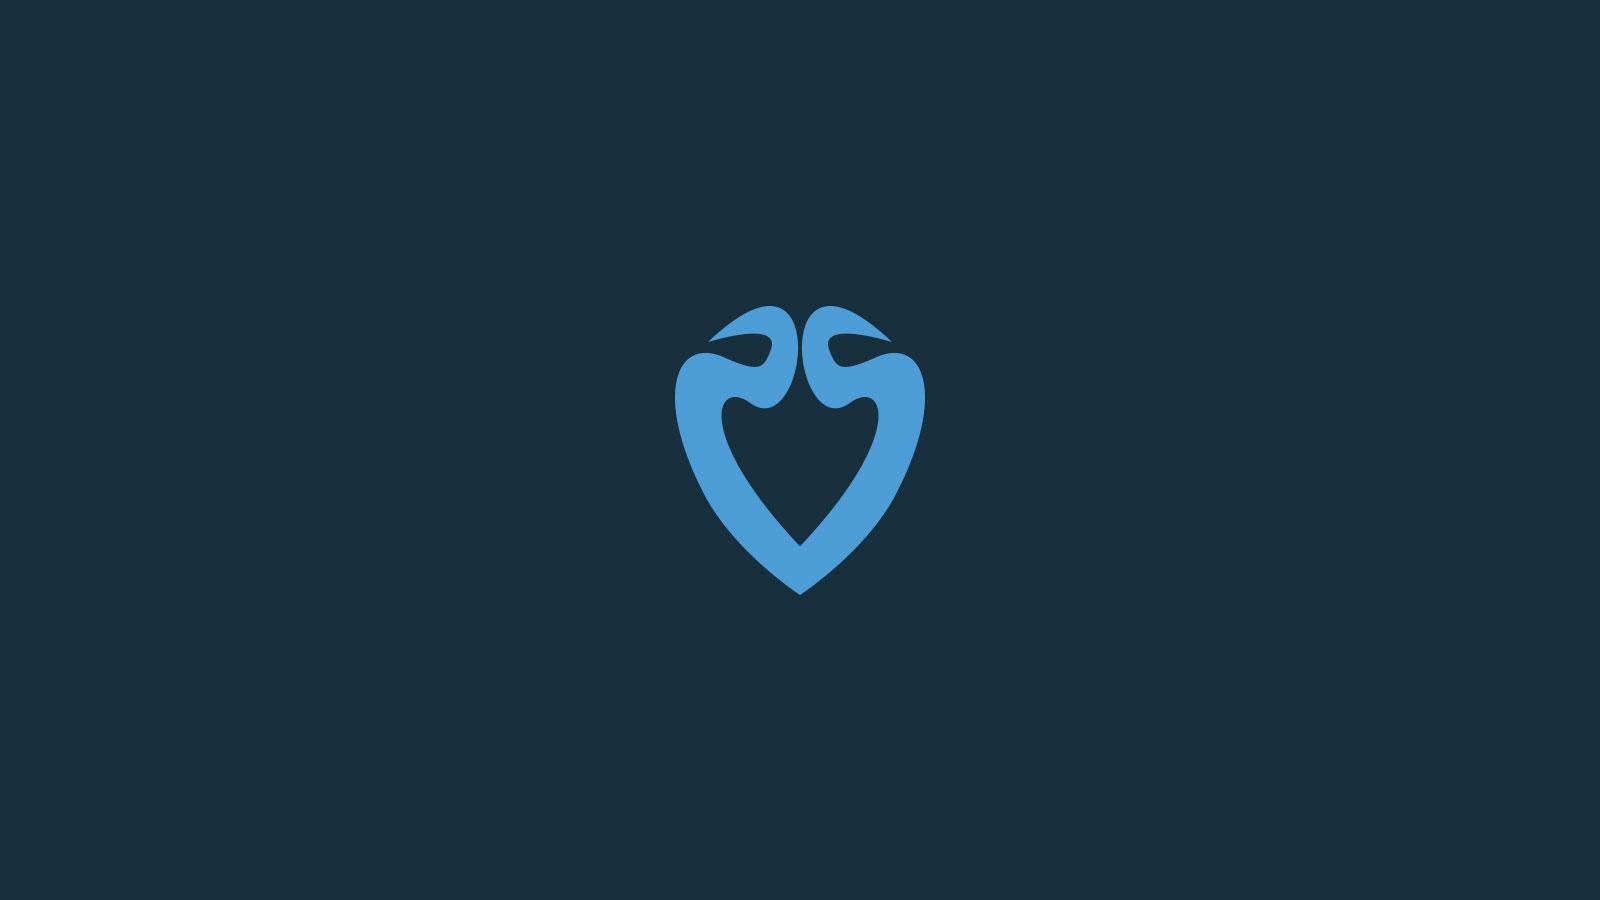 Logo design startup security עיצוב לוגו סטארטאפ